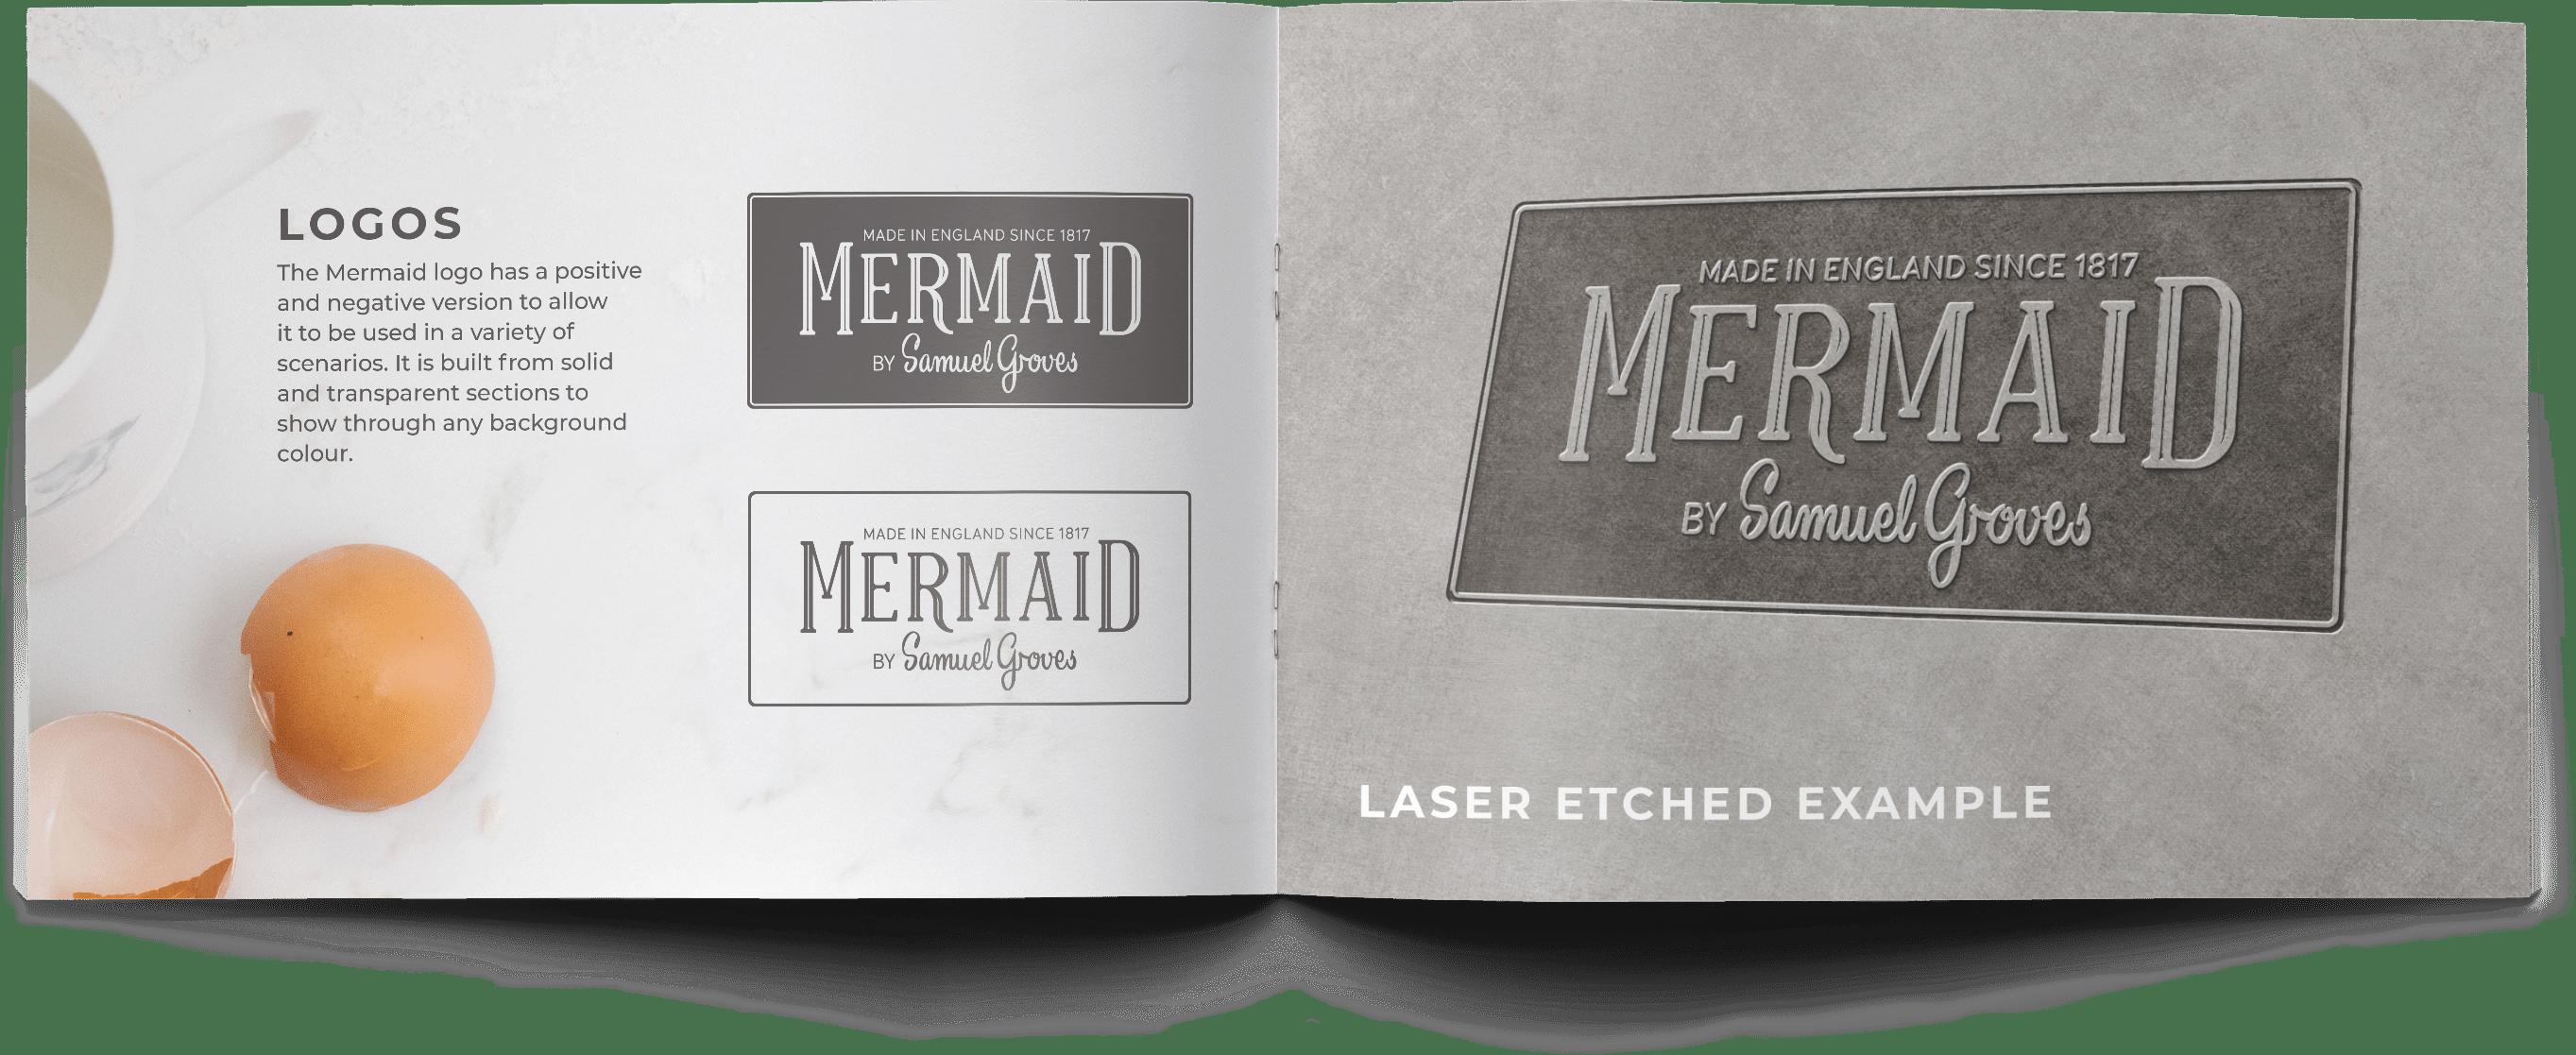 mermaid bakeware product packaging brand guidelines, logos page